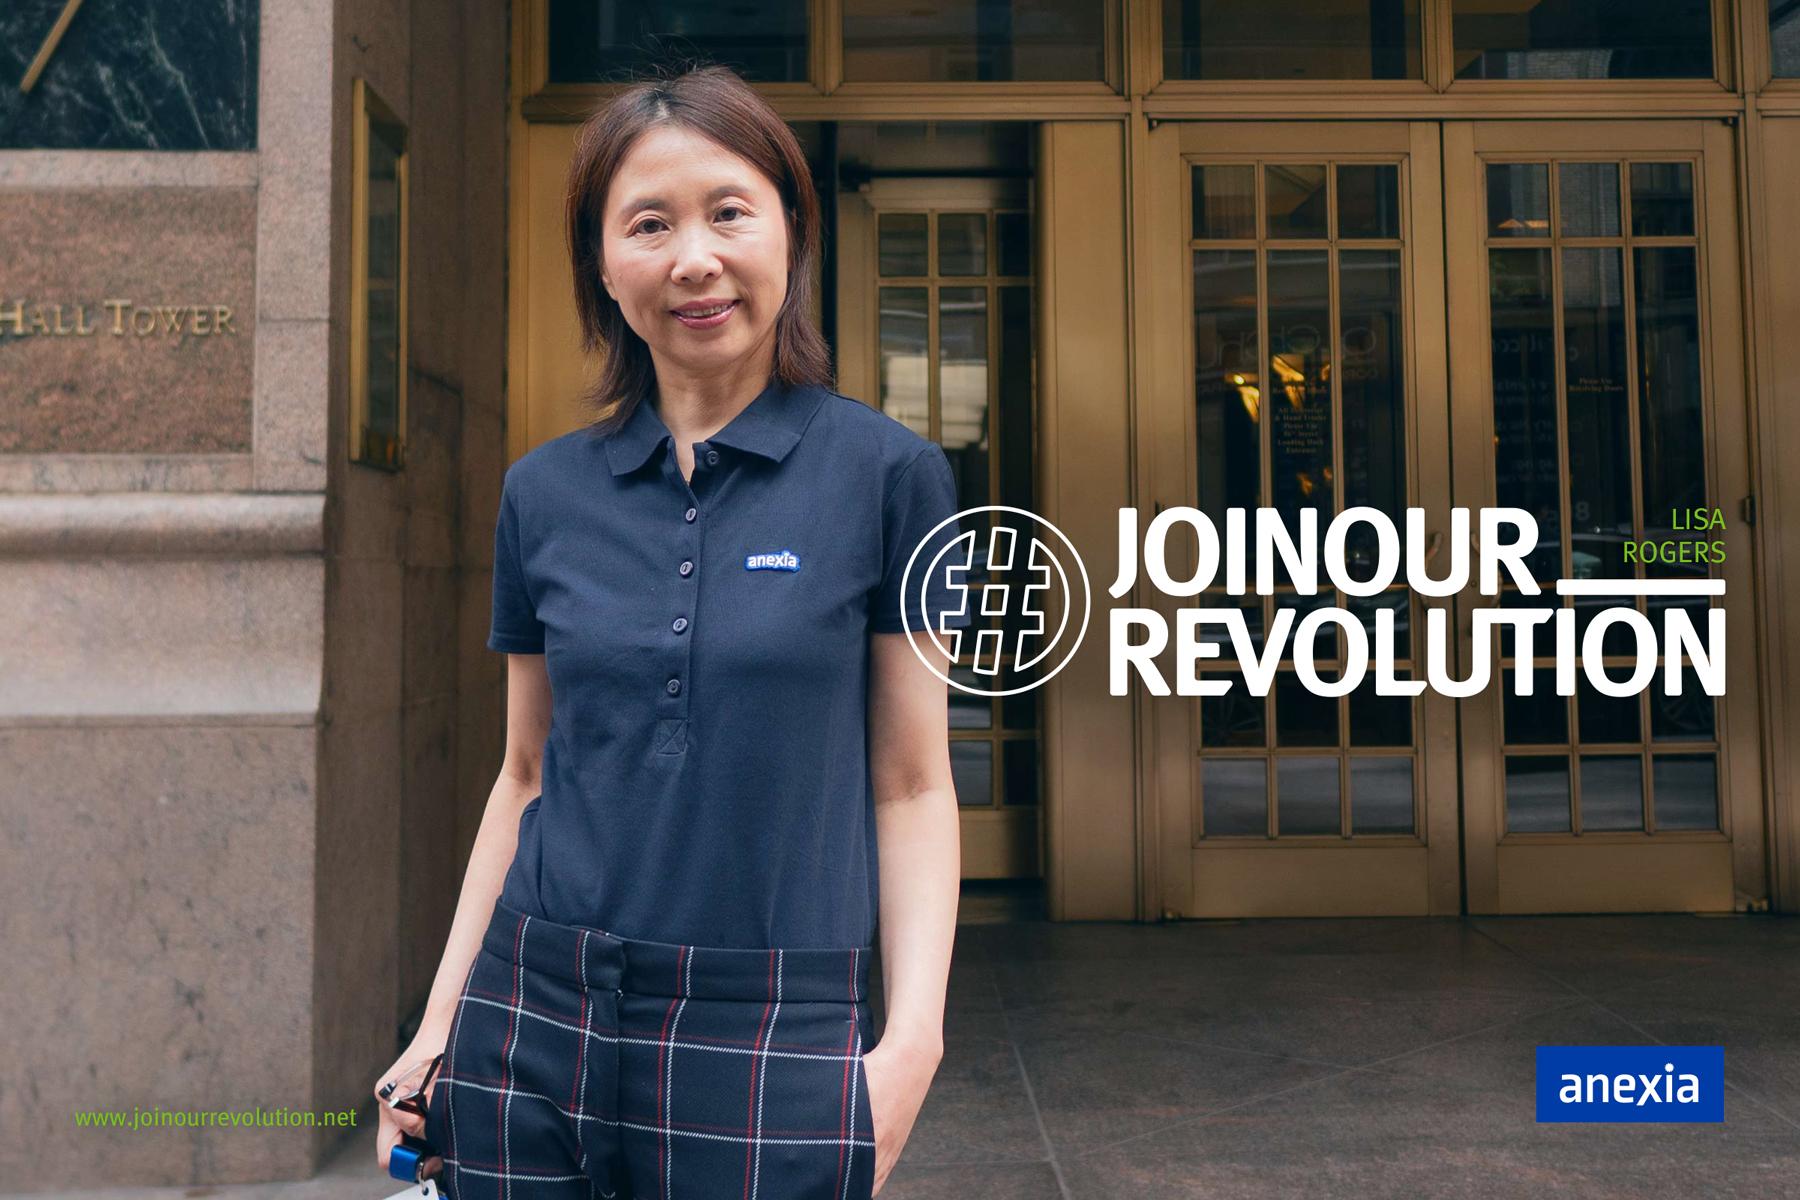 Lisa Rogers journourrevolution Carnegie Hall Tower